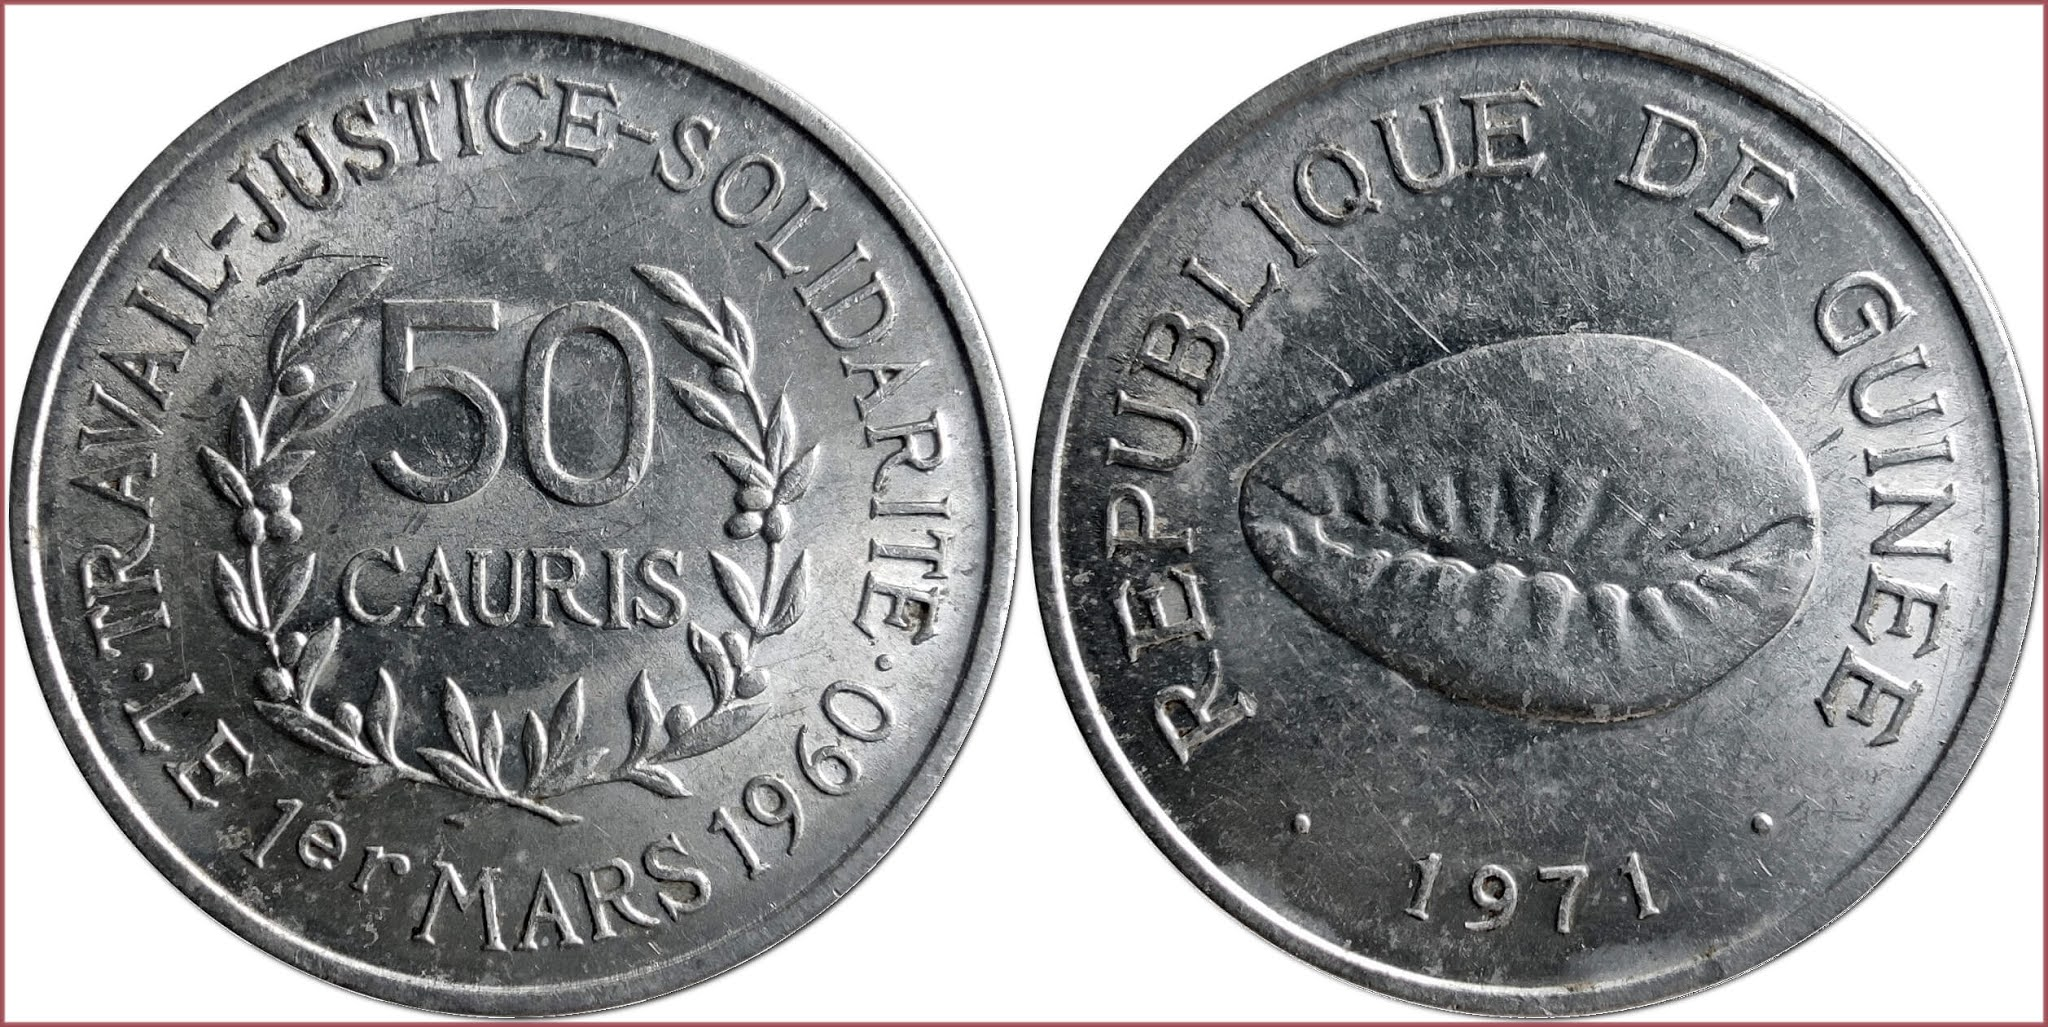 50 cauri, 1971: Republic of Guinea